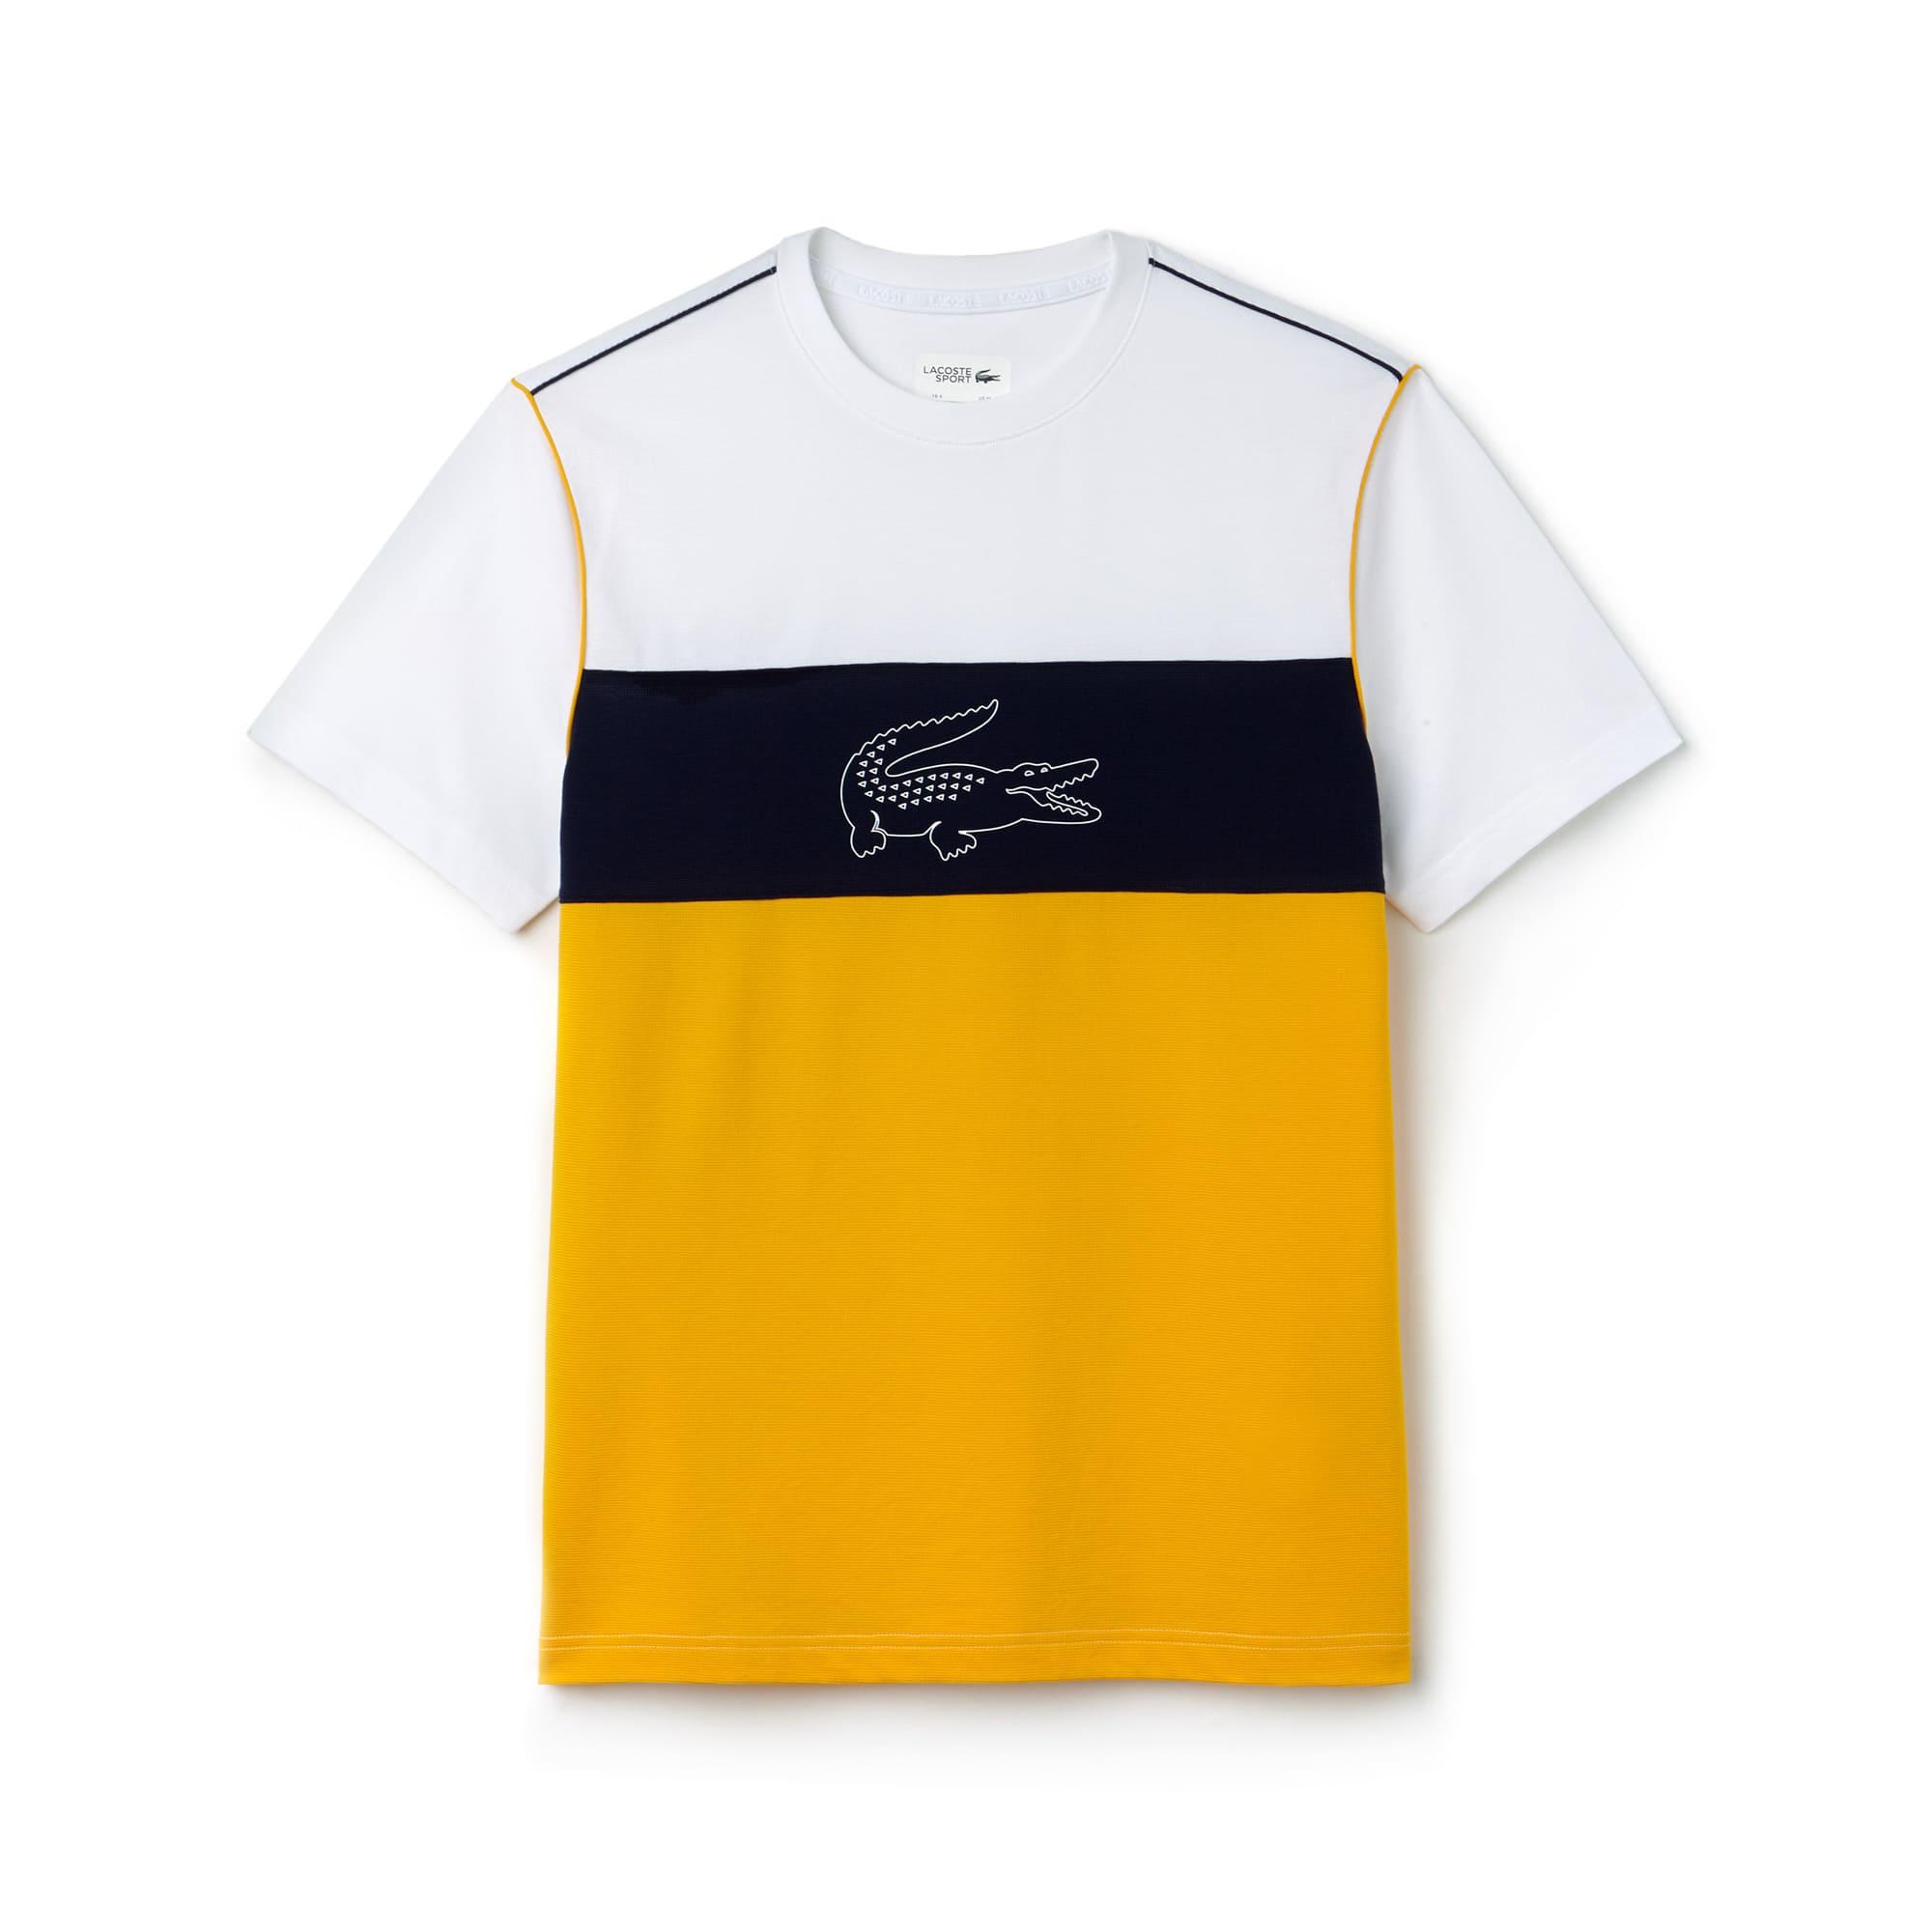 Camiseta Lacoste SPORT en algodón ultra ligero técnico color block